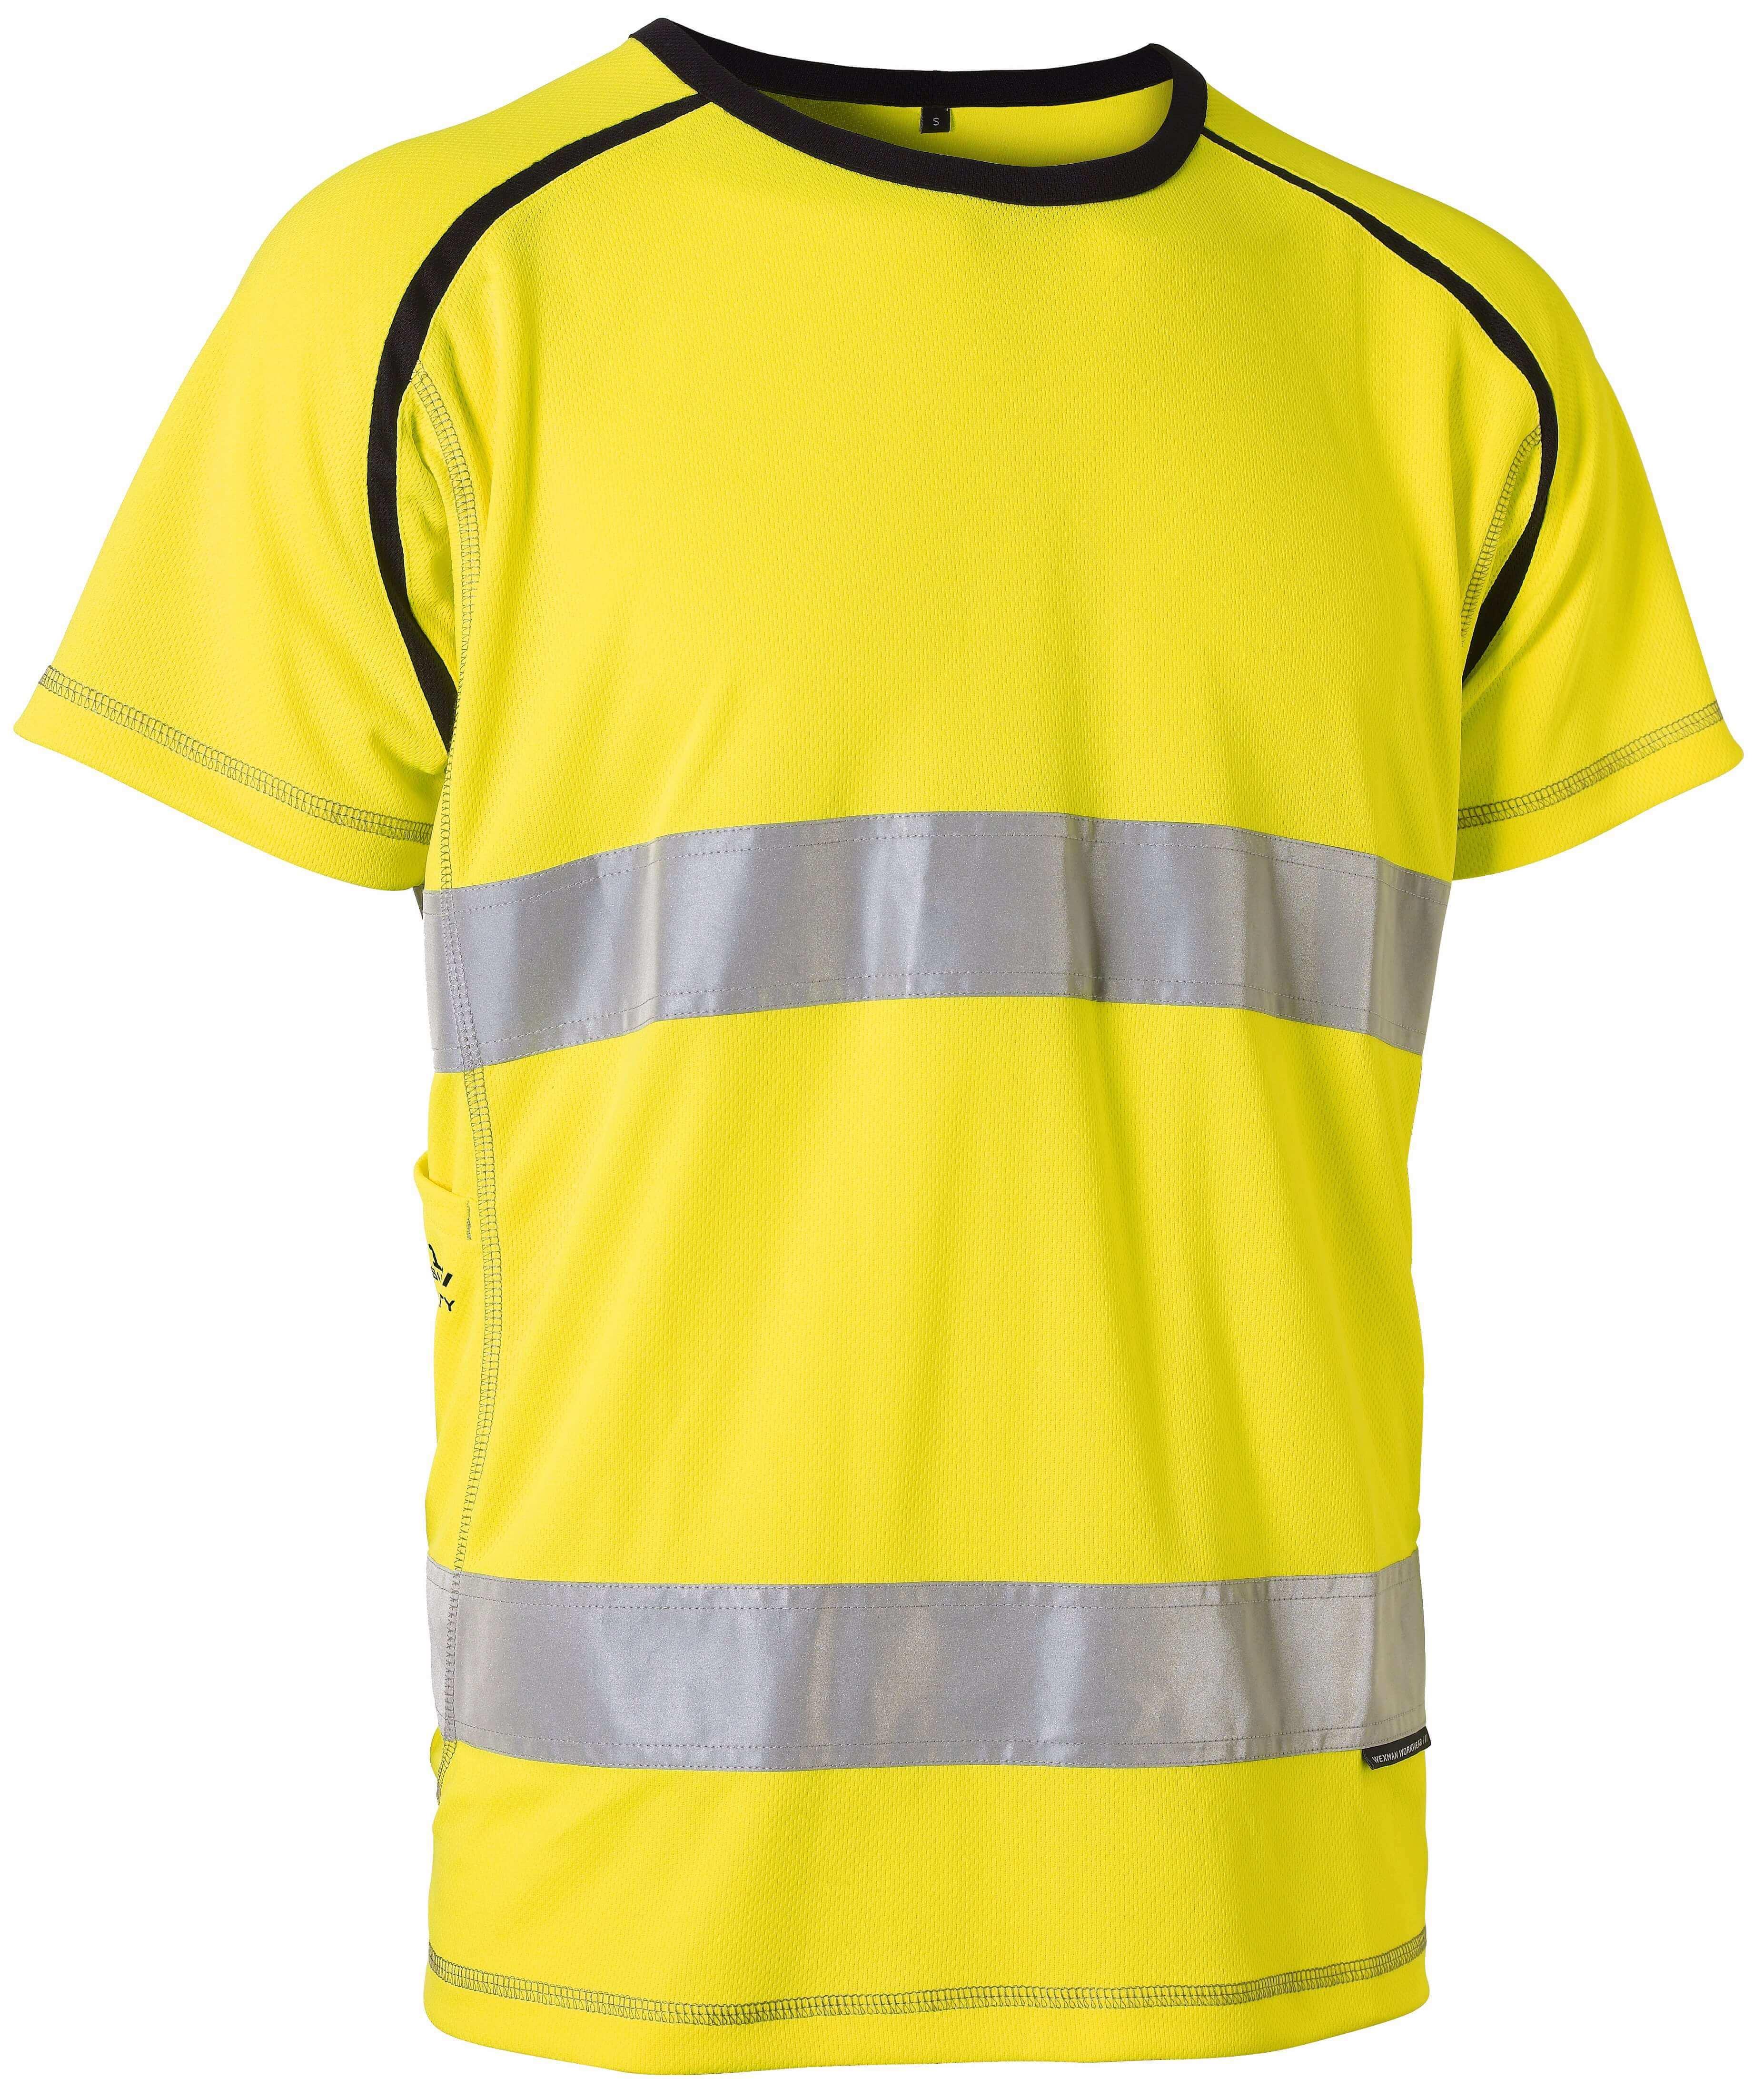 Kända T-shirt varsel med reflex   Wexman Workwear® JG-33